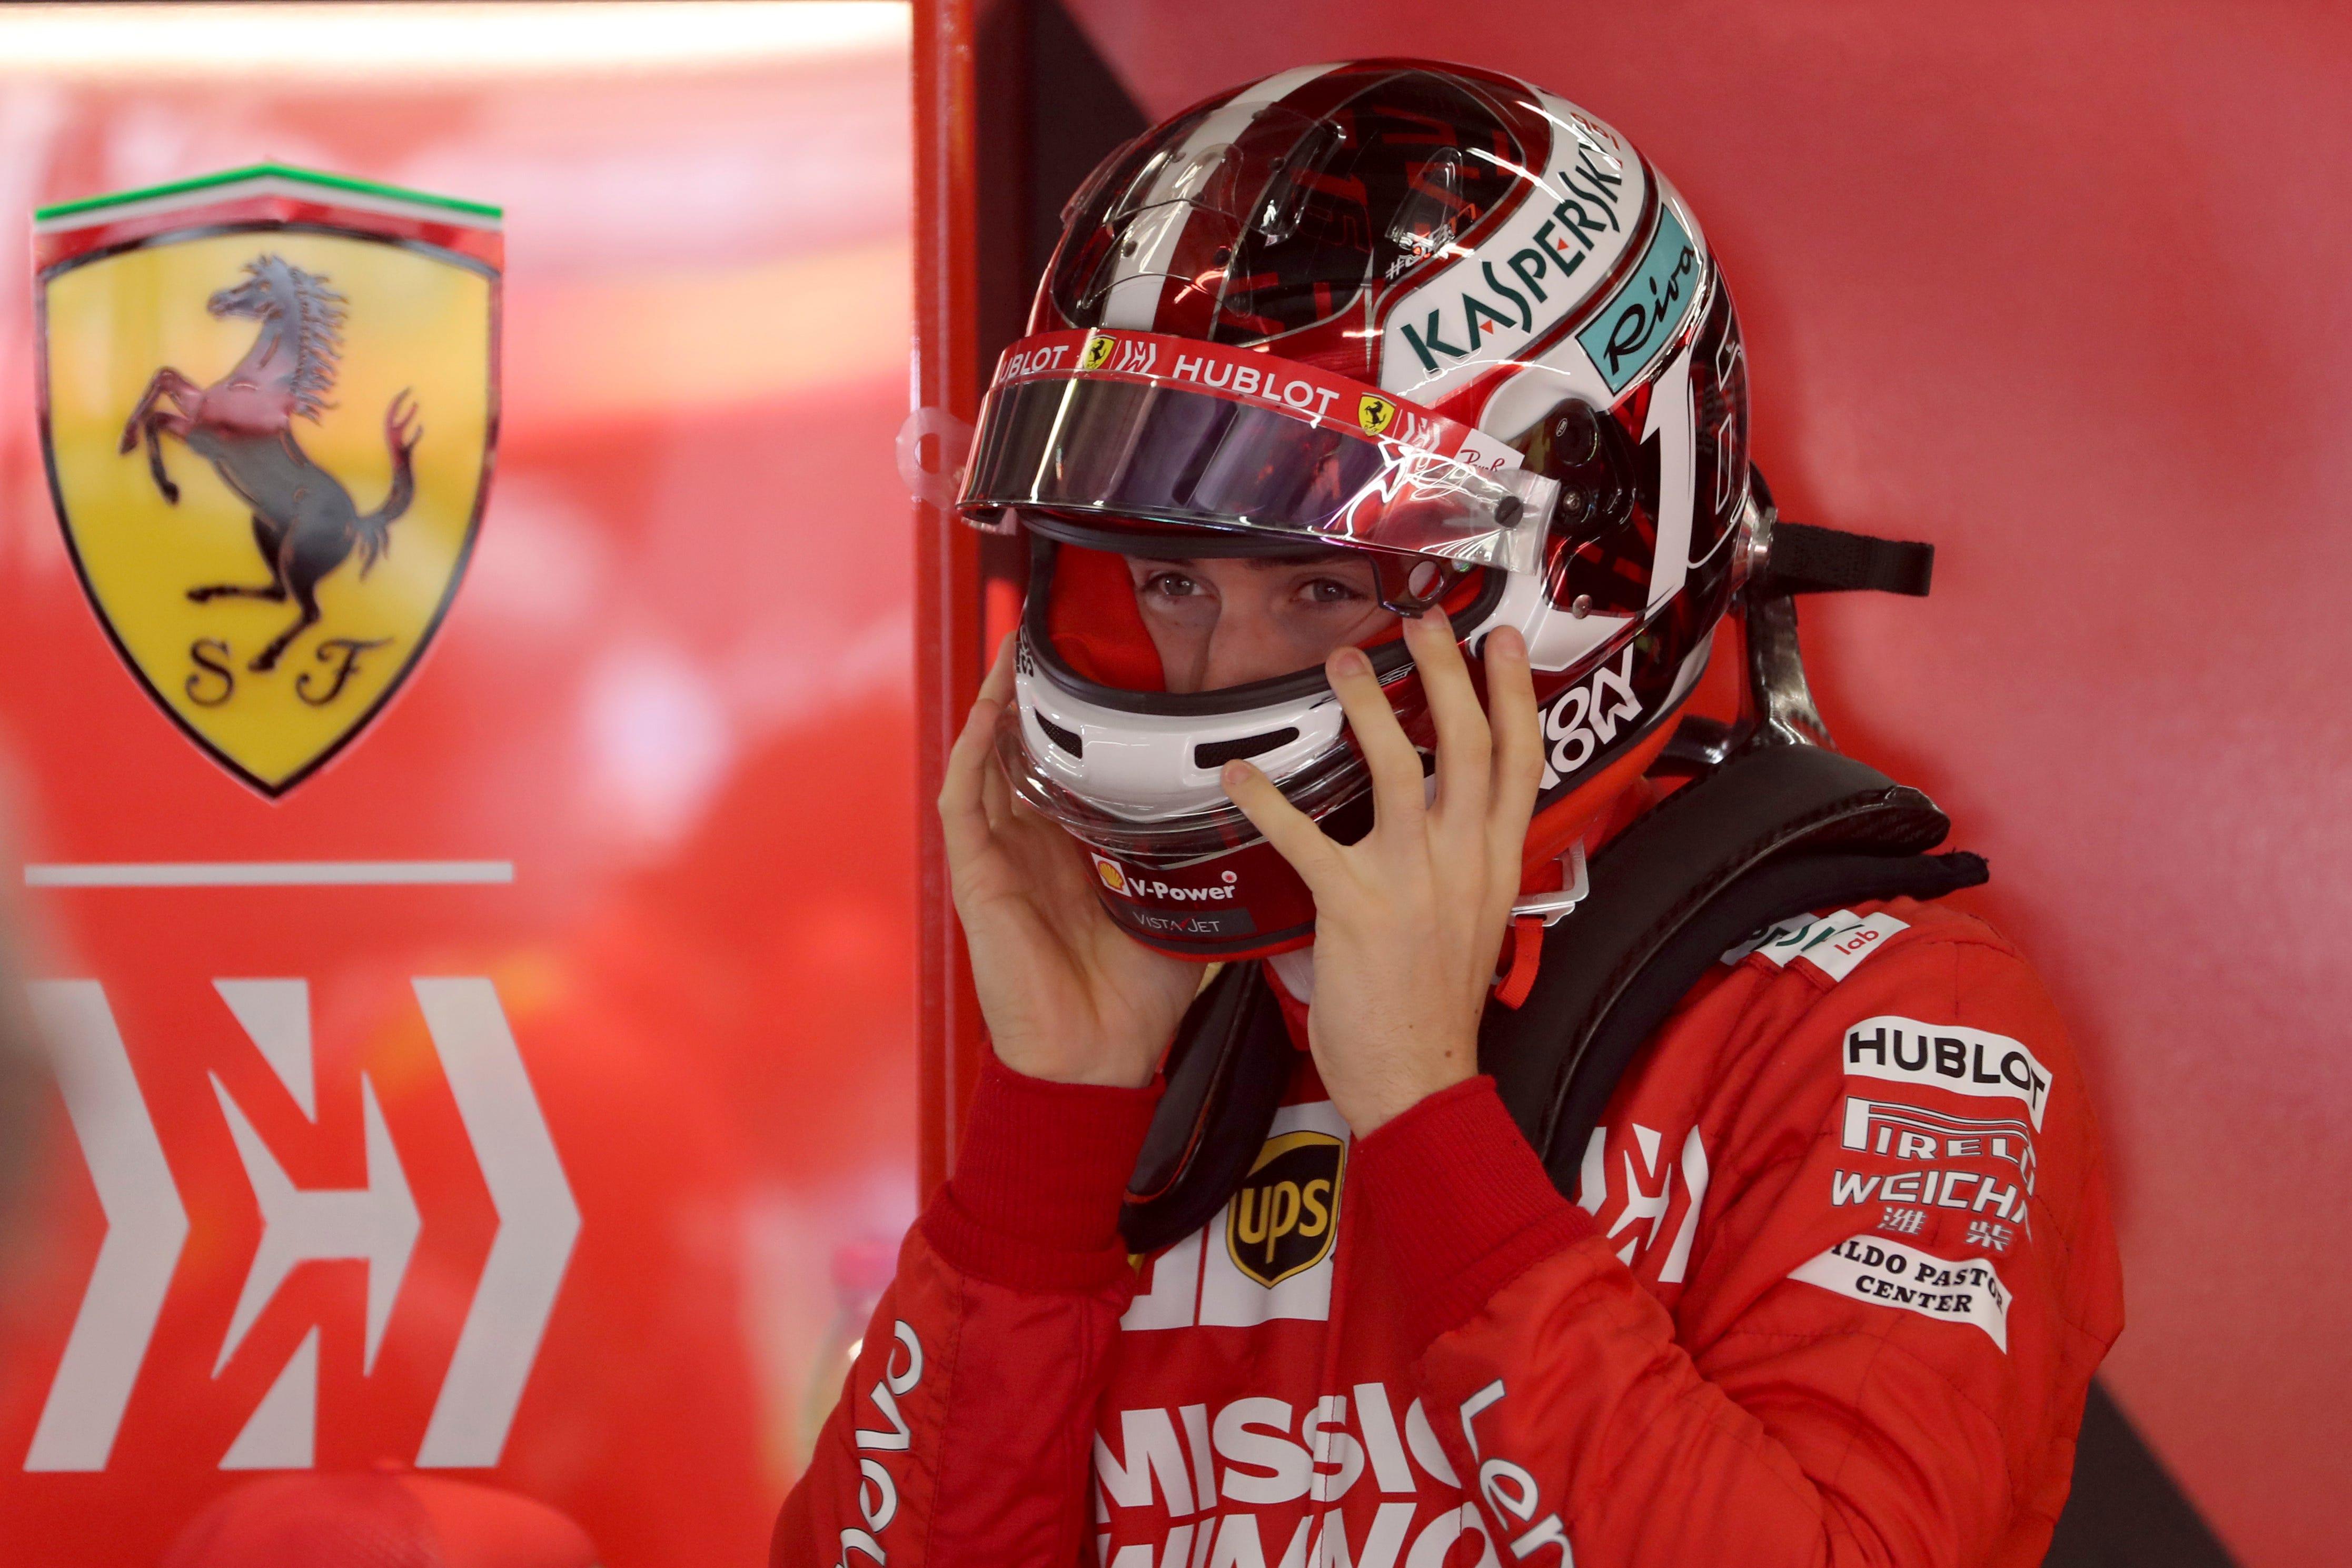 Bottas, Vettel lead Chinese GP practice sessions